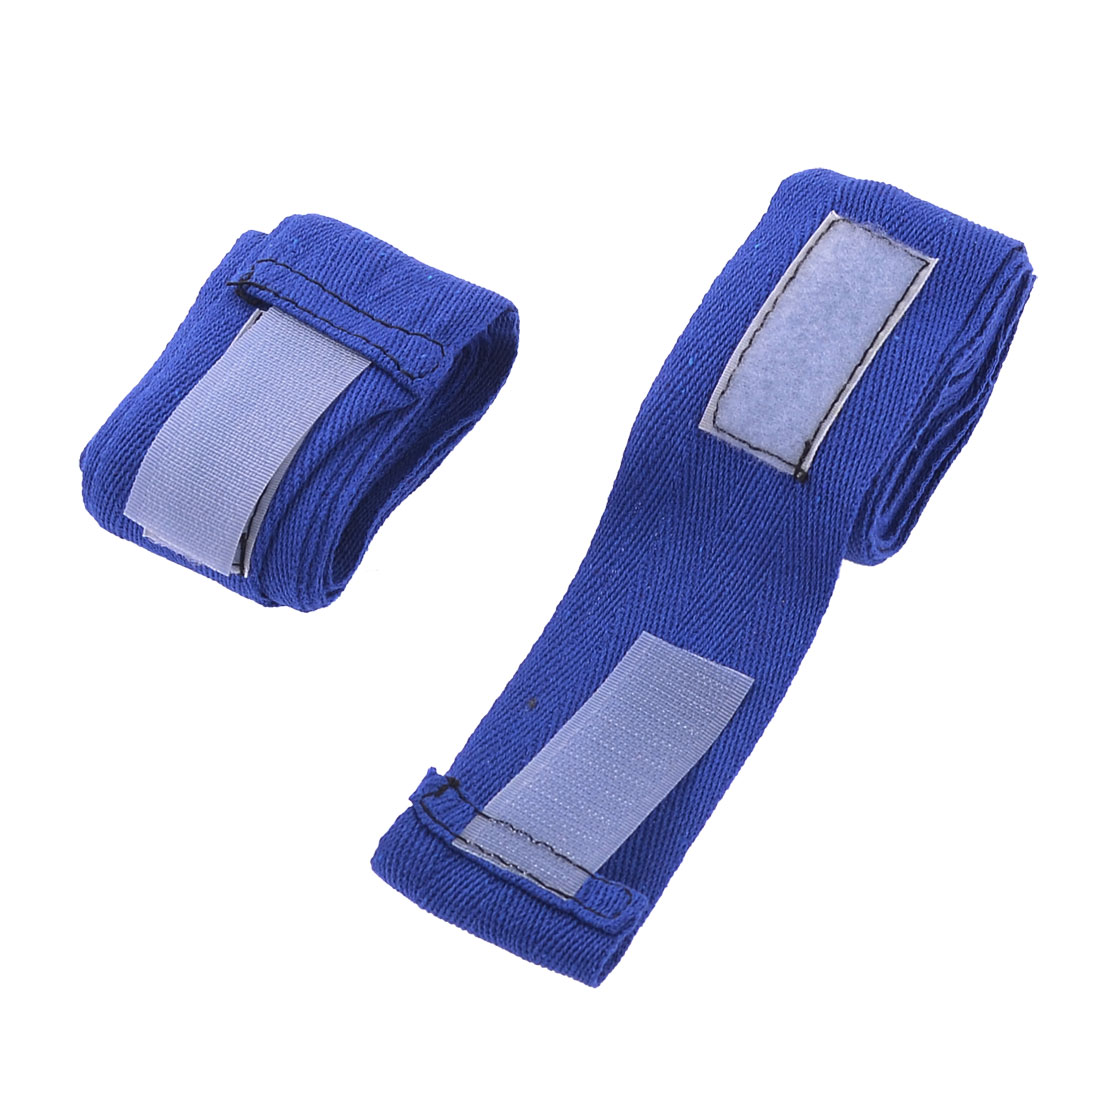 2.3M Hook Loop Closure Design Texturing Blue Kickboxing Hand Wraps Pair